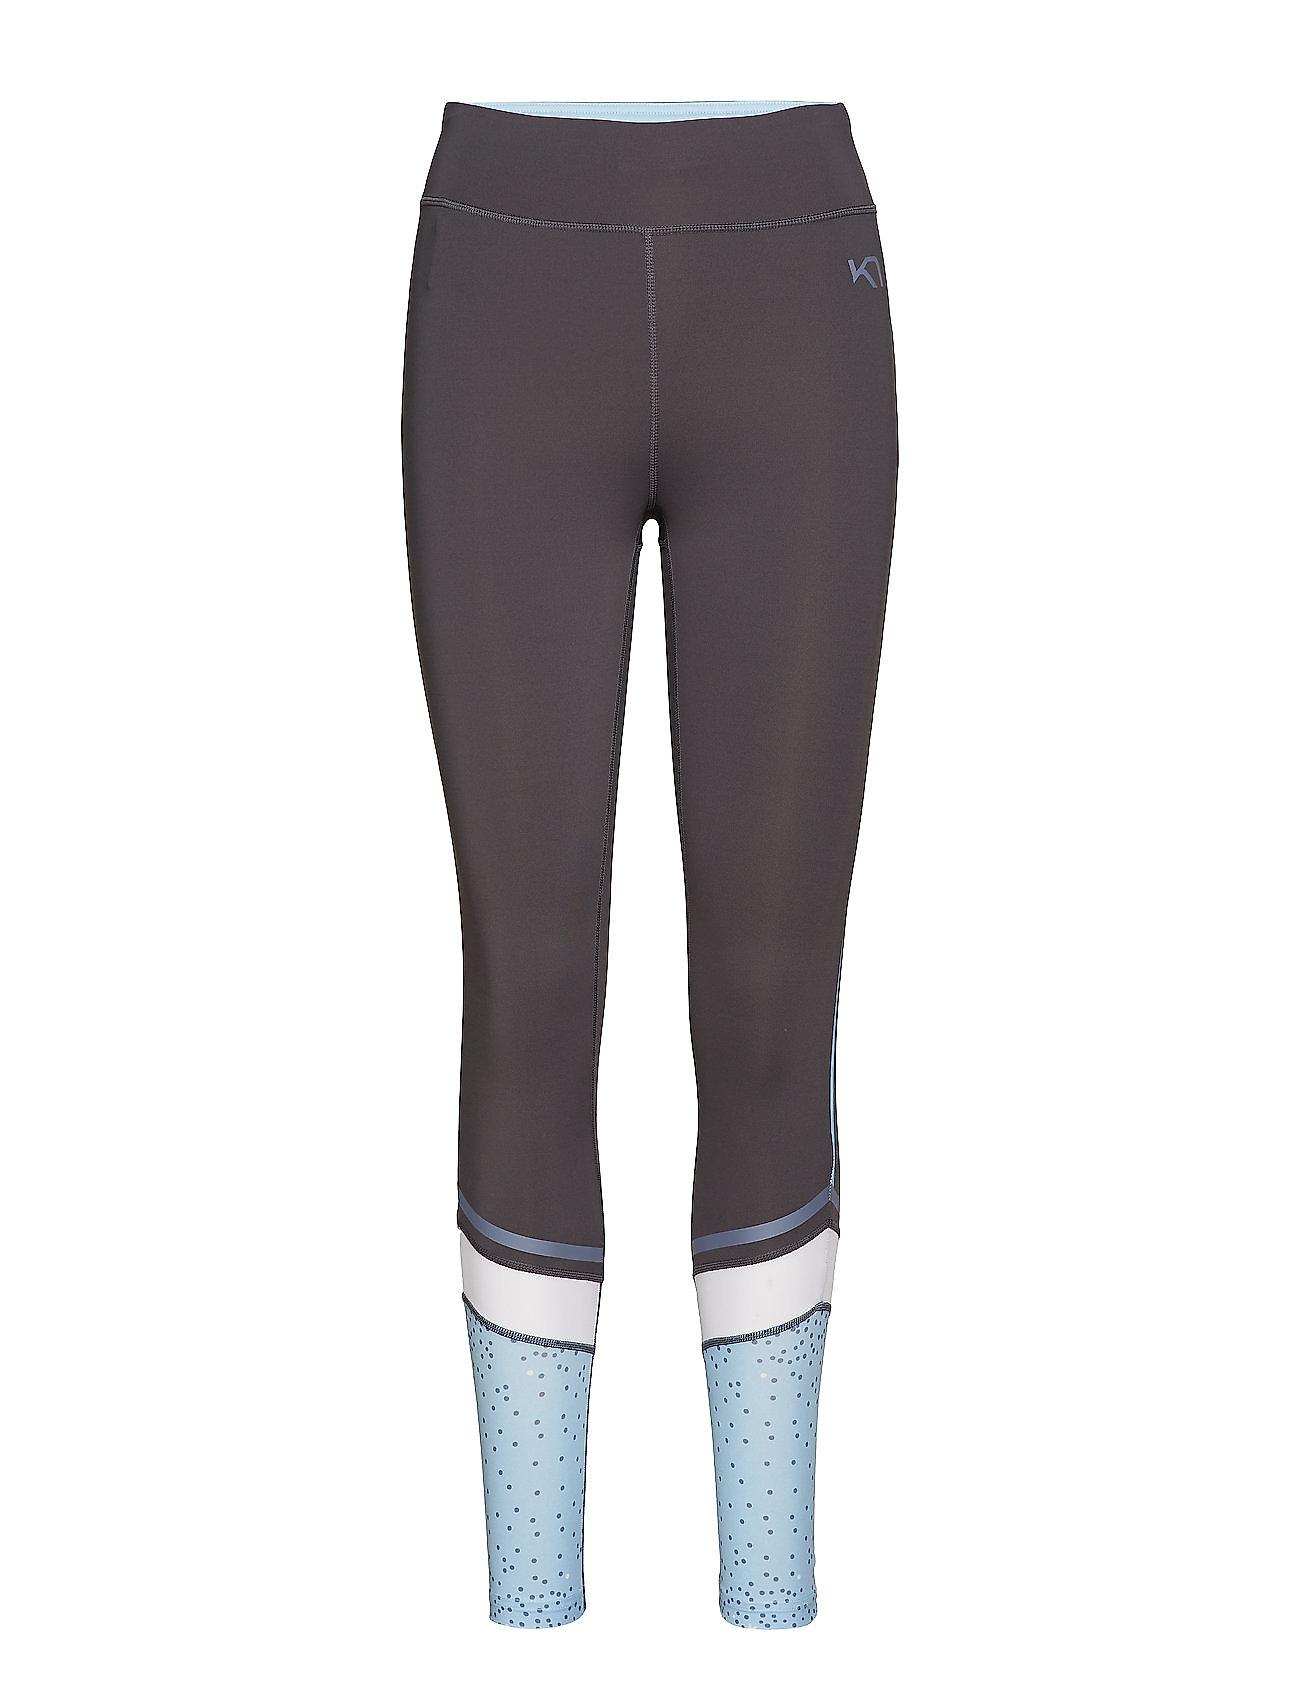 Kari Traa ELISA TIGHTS Leggings & tights